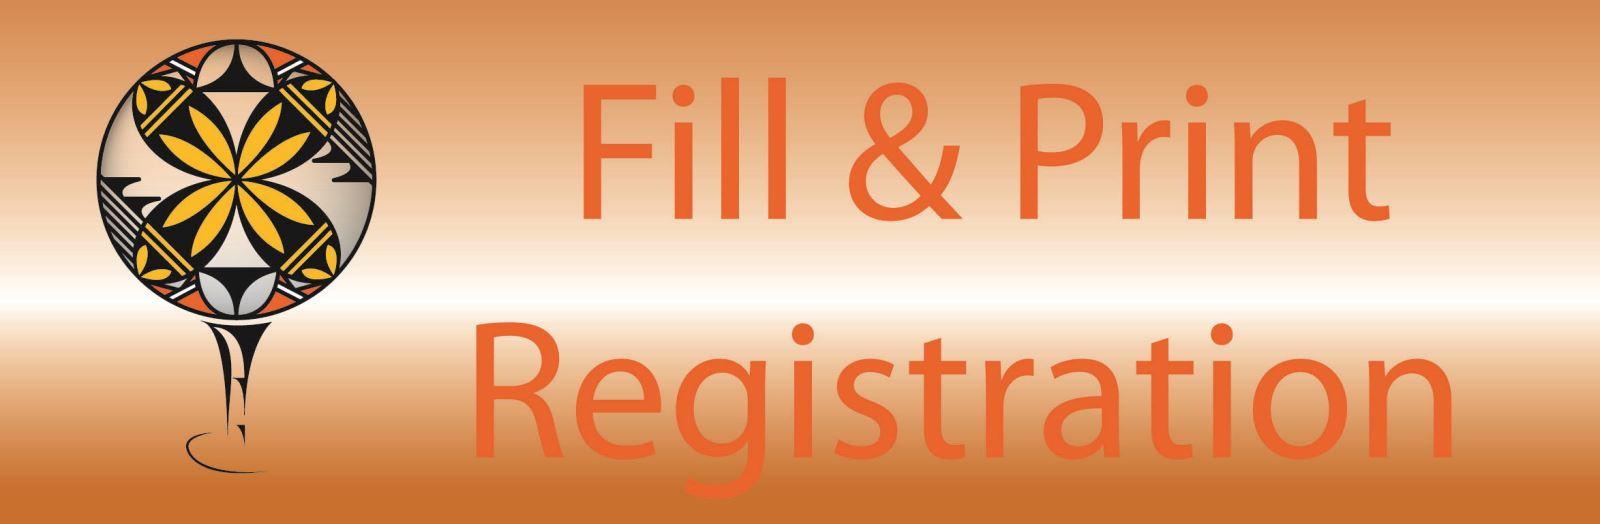 Fill & Print Registration button